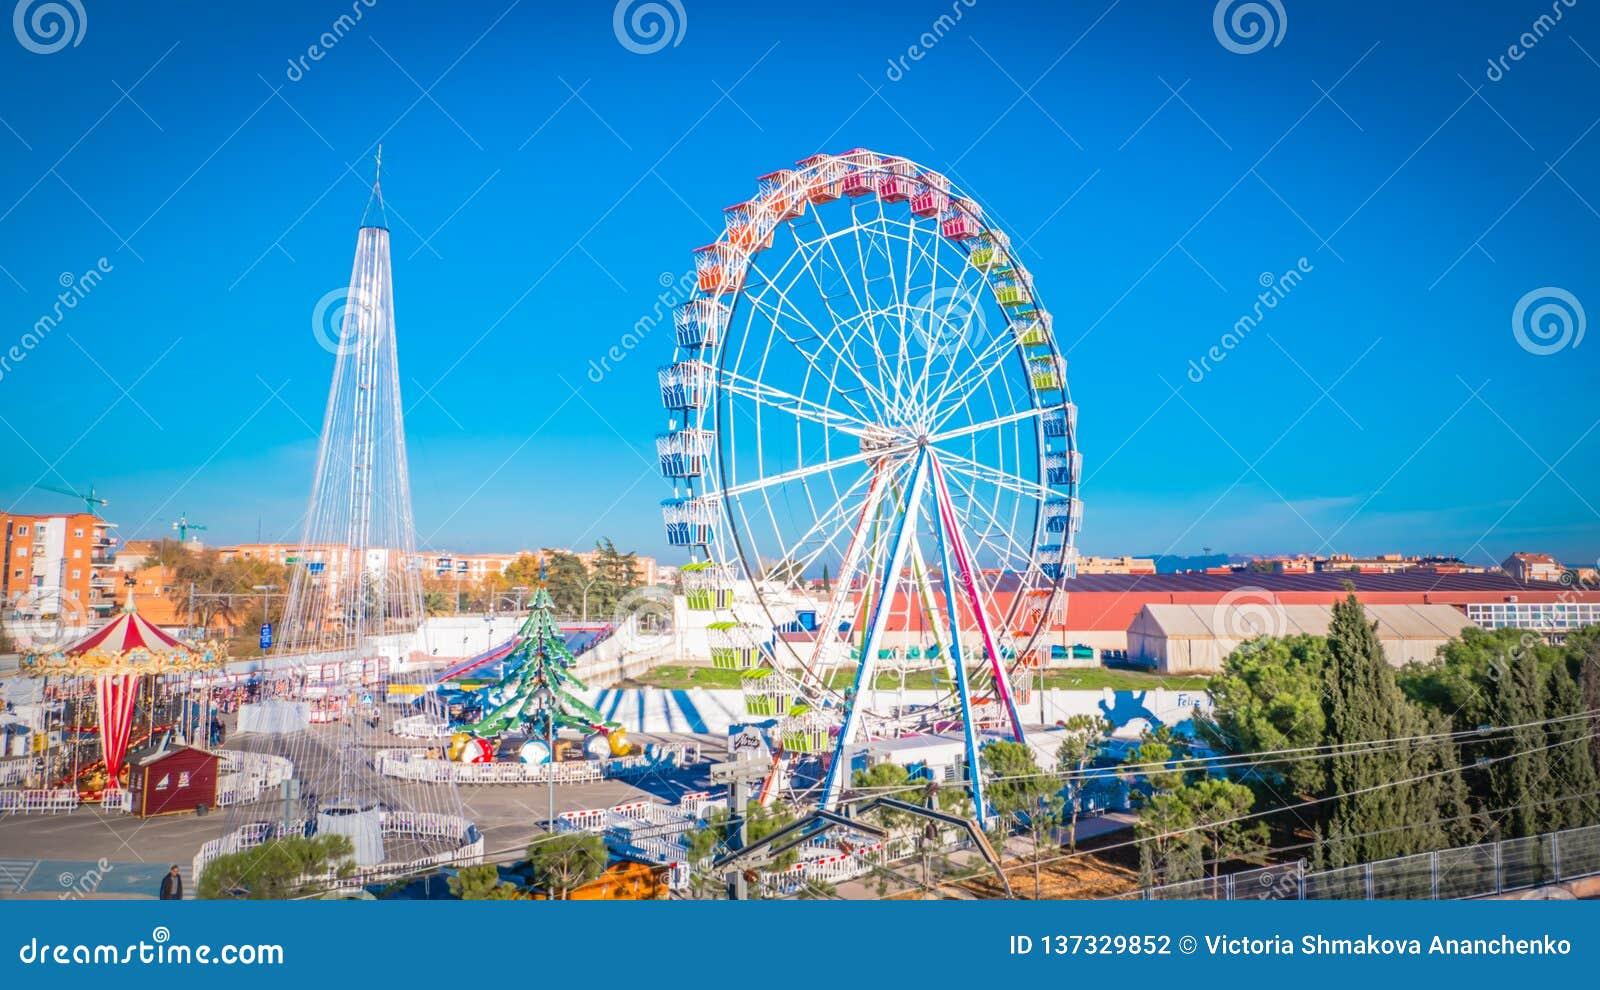 Festive Christmas fair with a Ferris wheel in Torrejon de Ardoz near Madrid, Spain